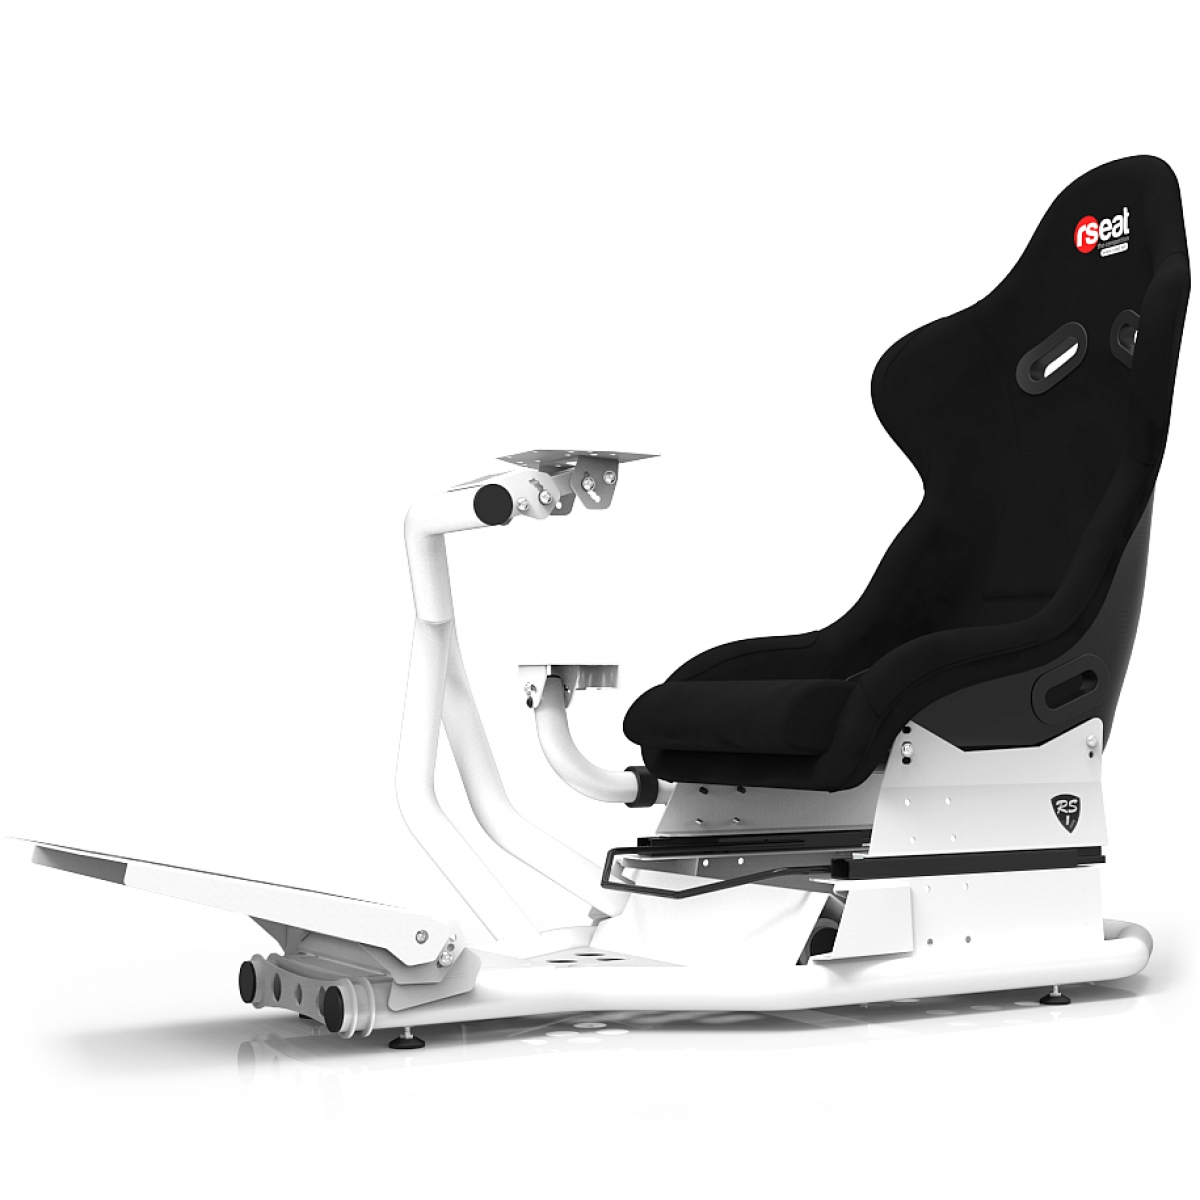 RS1 Alcantara®/White